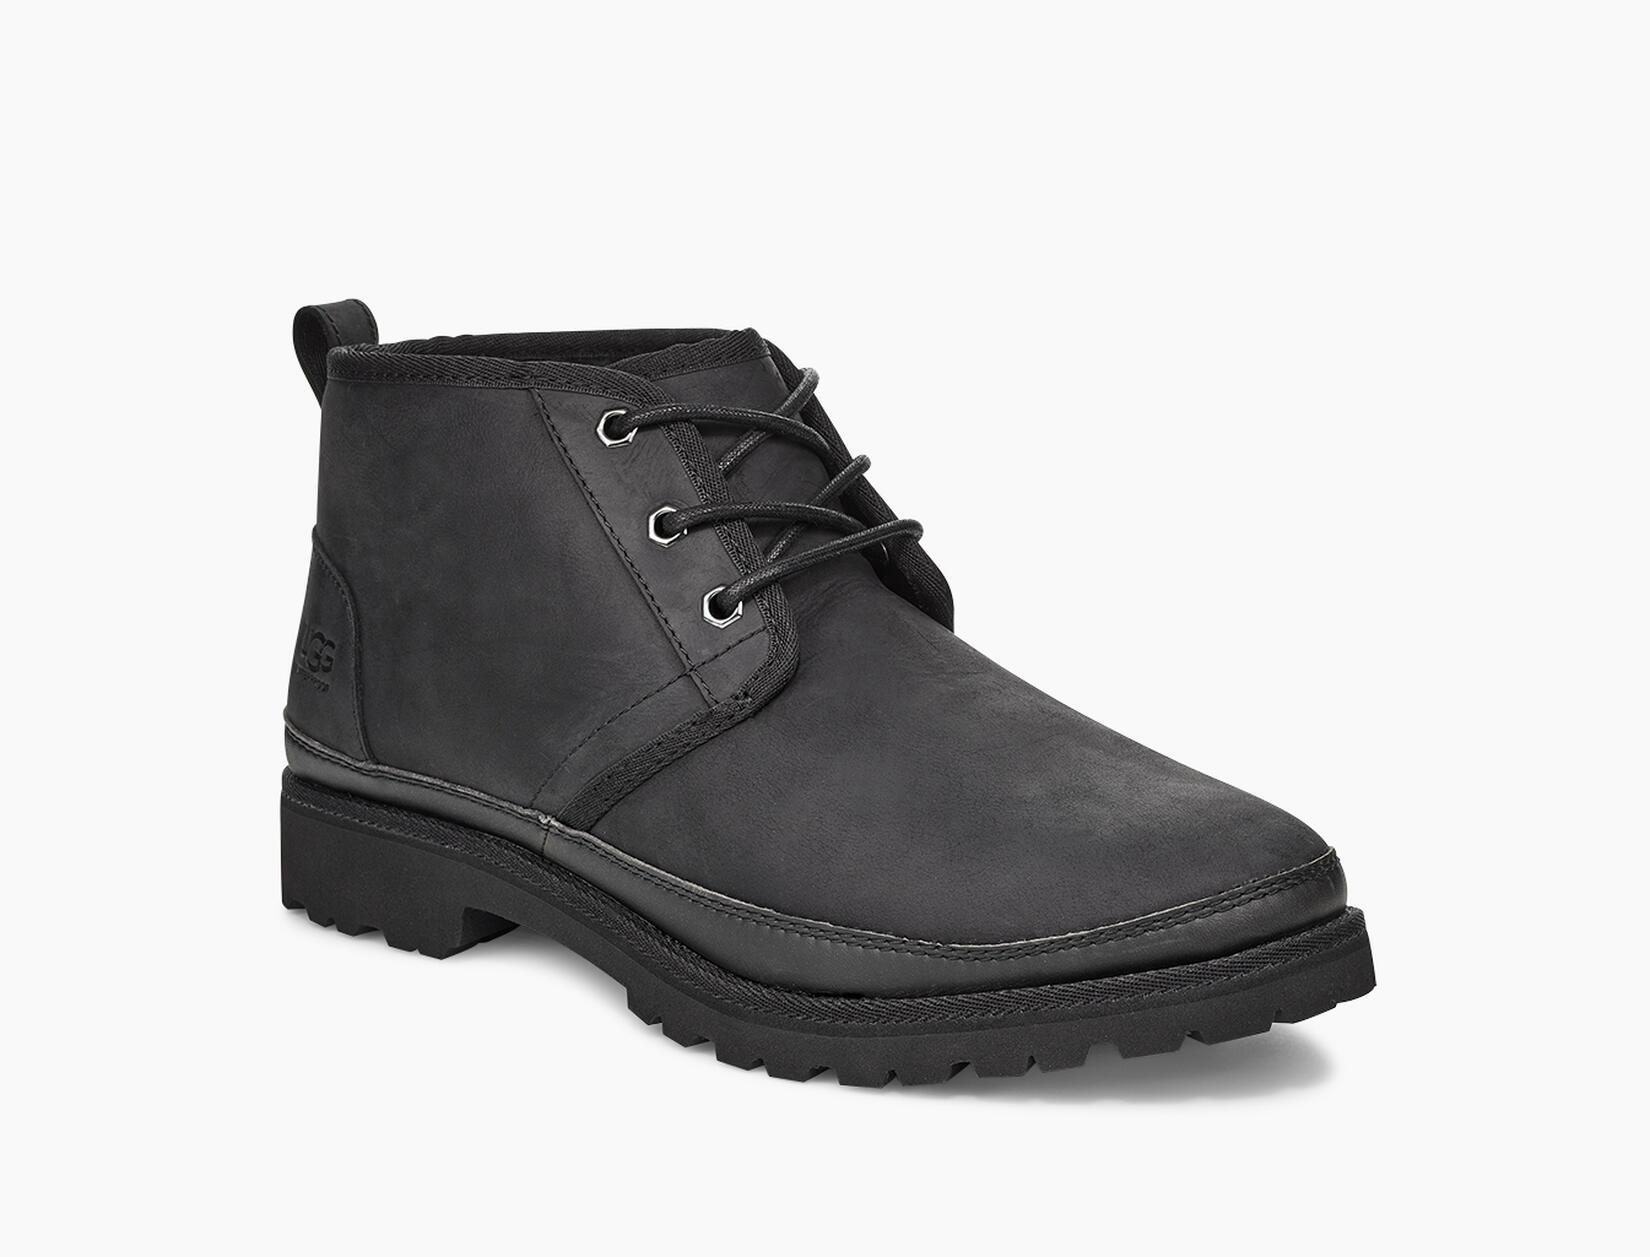 Neuland Waterproof Boot